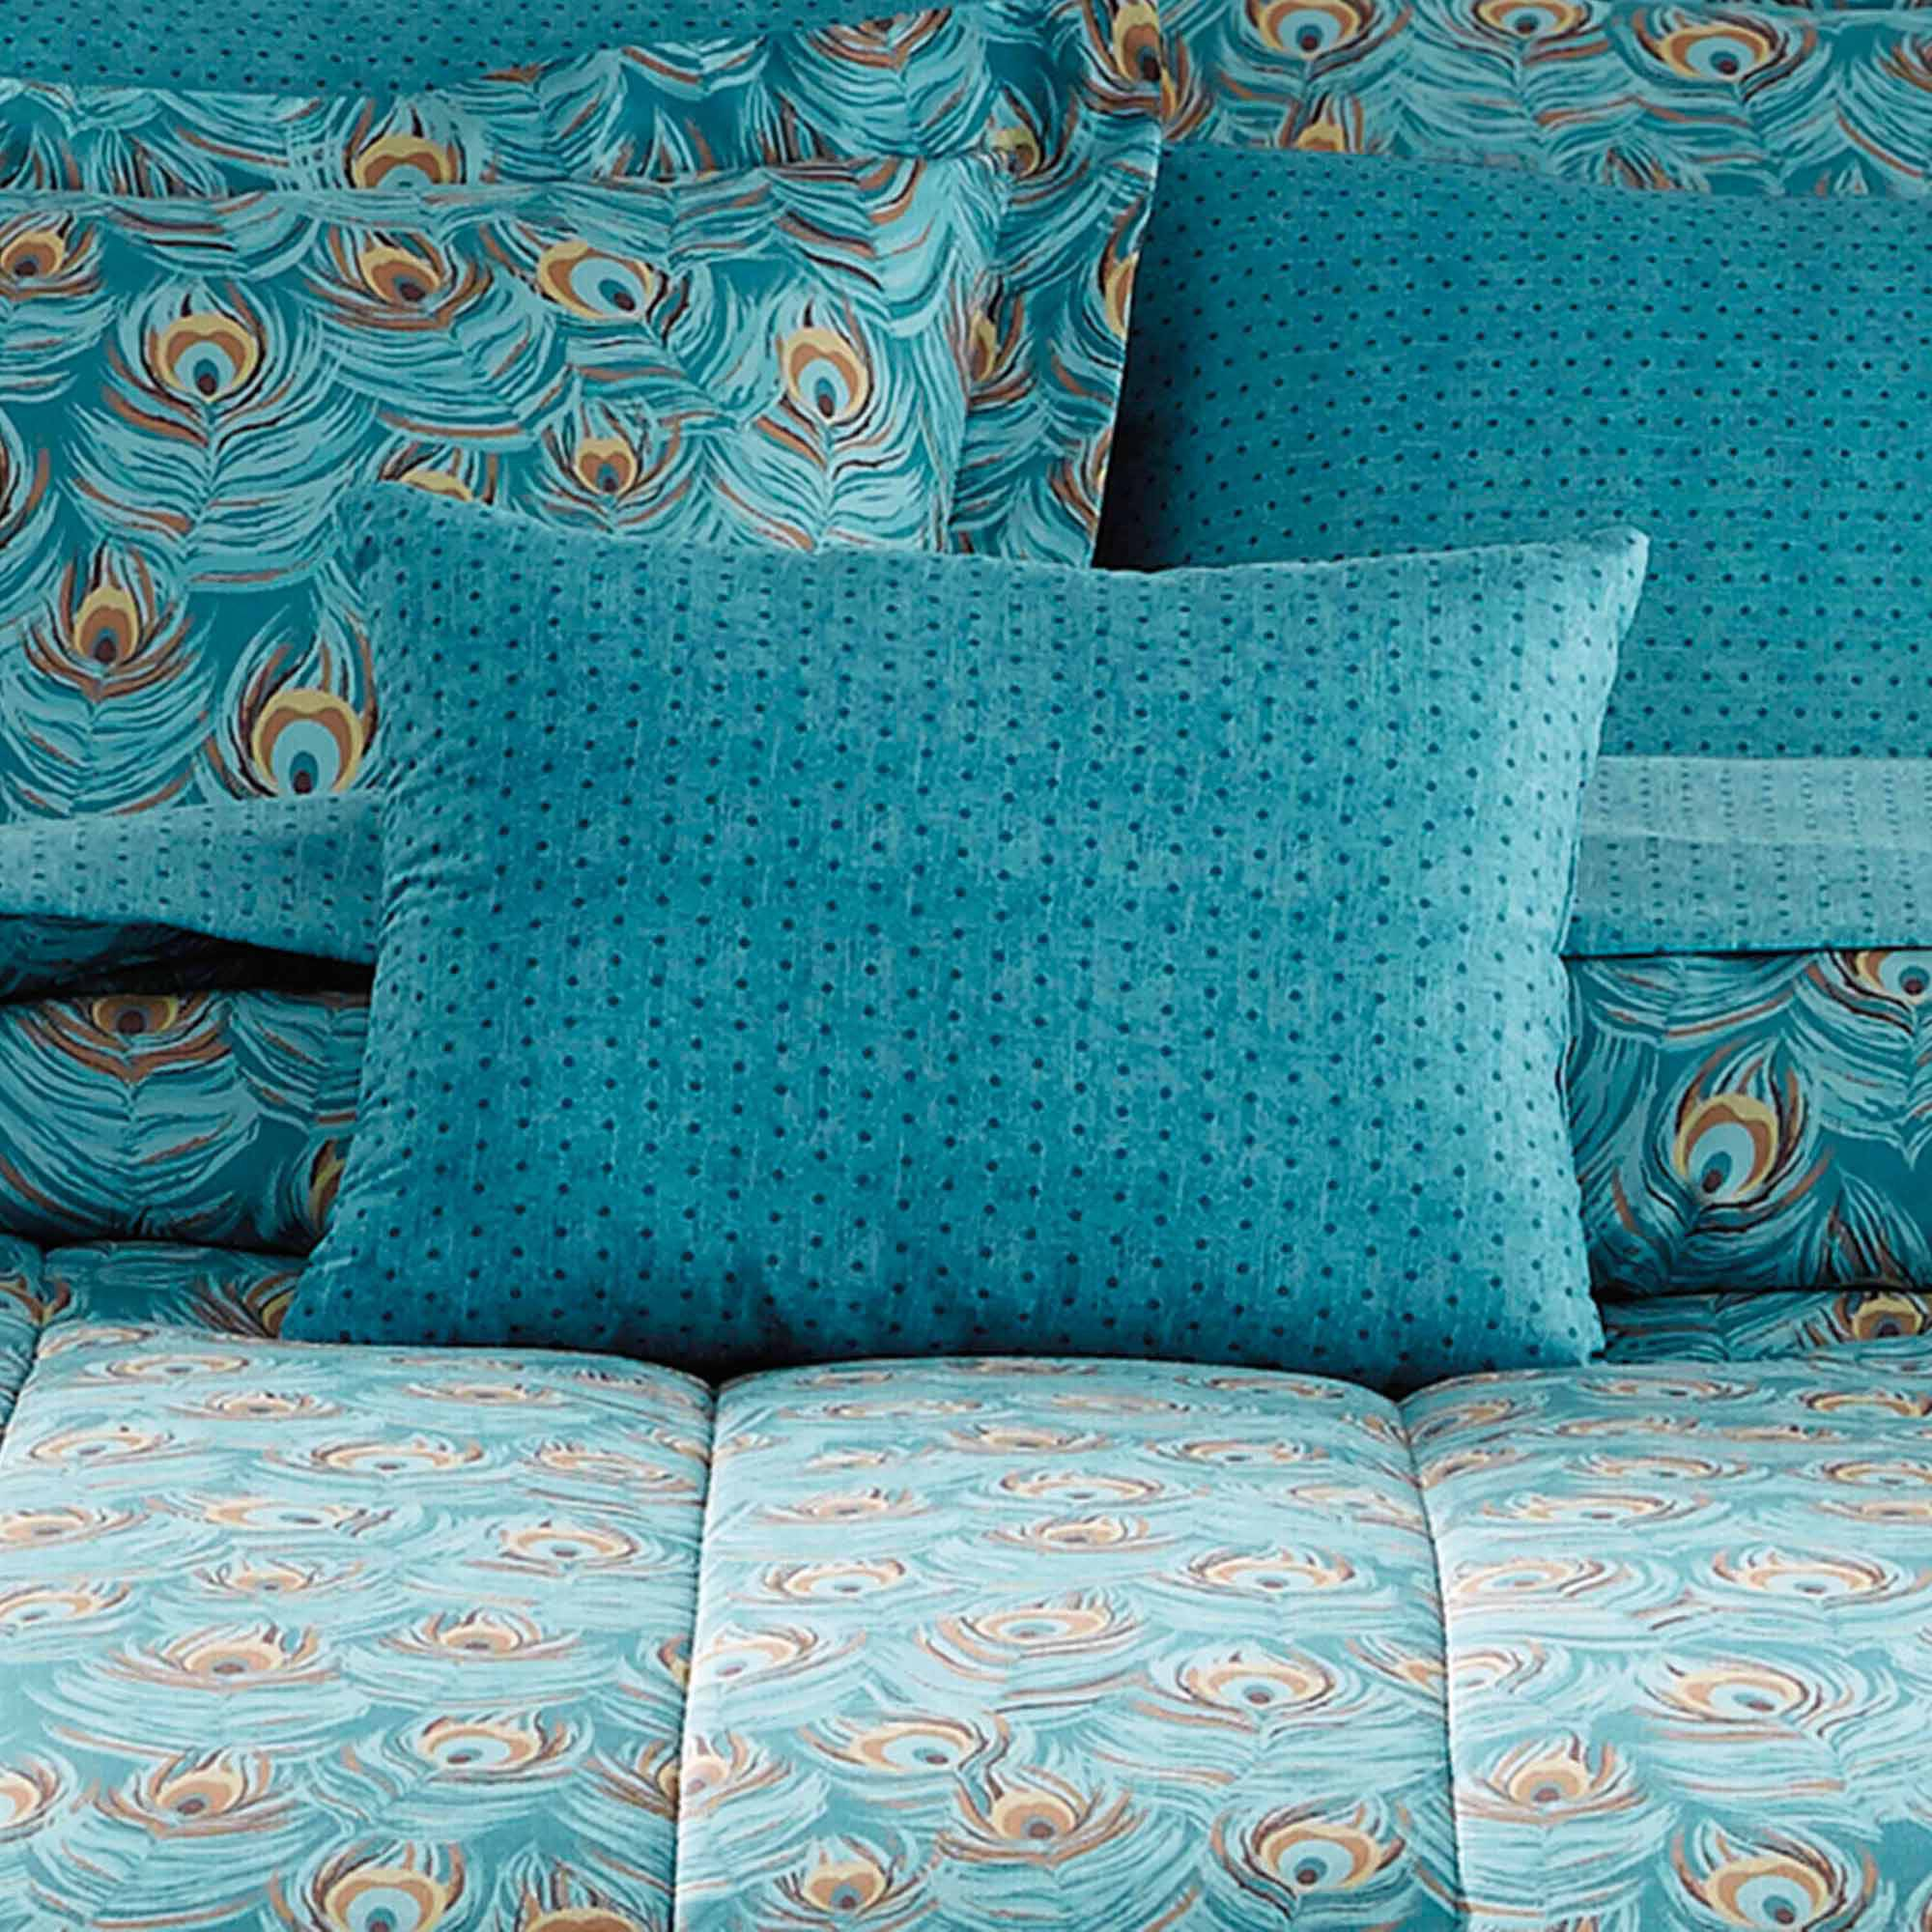 Peacock bedroom set - Mainstays Bed In A Bag Bedding Comforter Set Peacock Feather Walmart Com